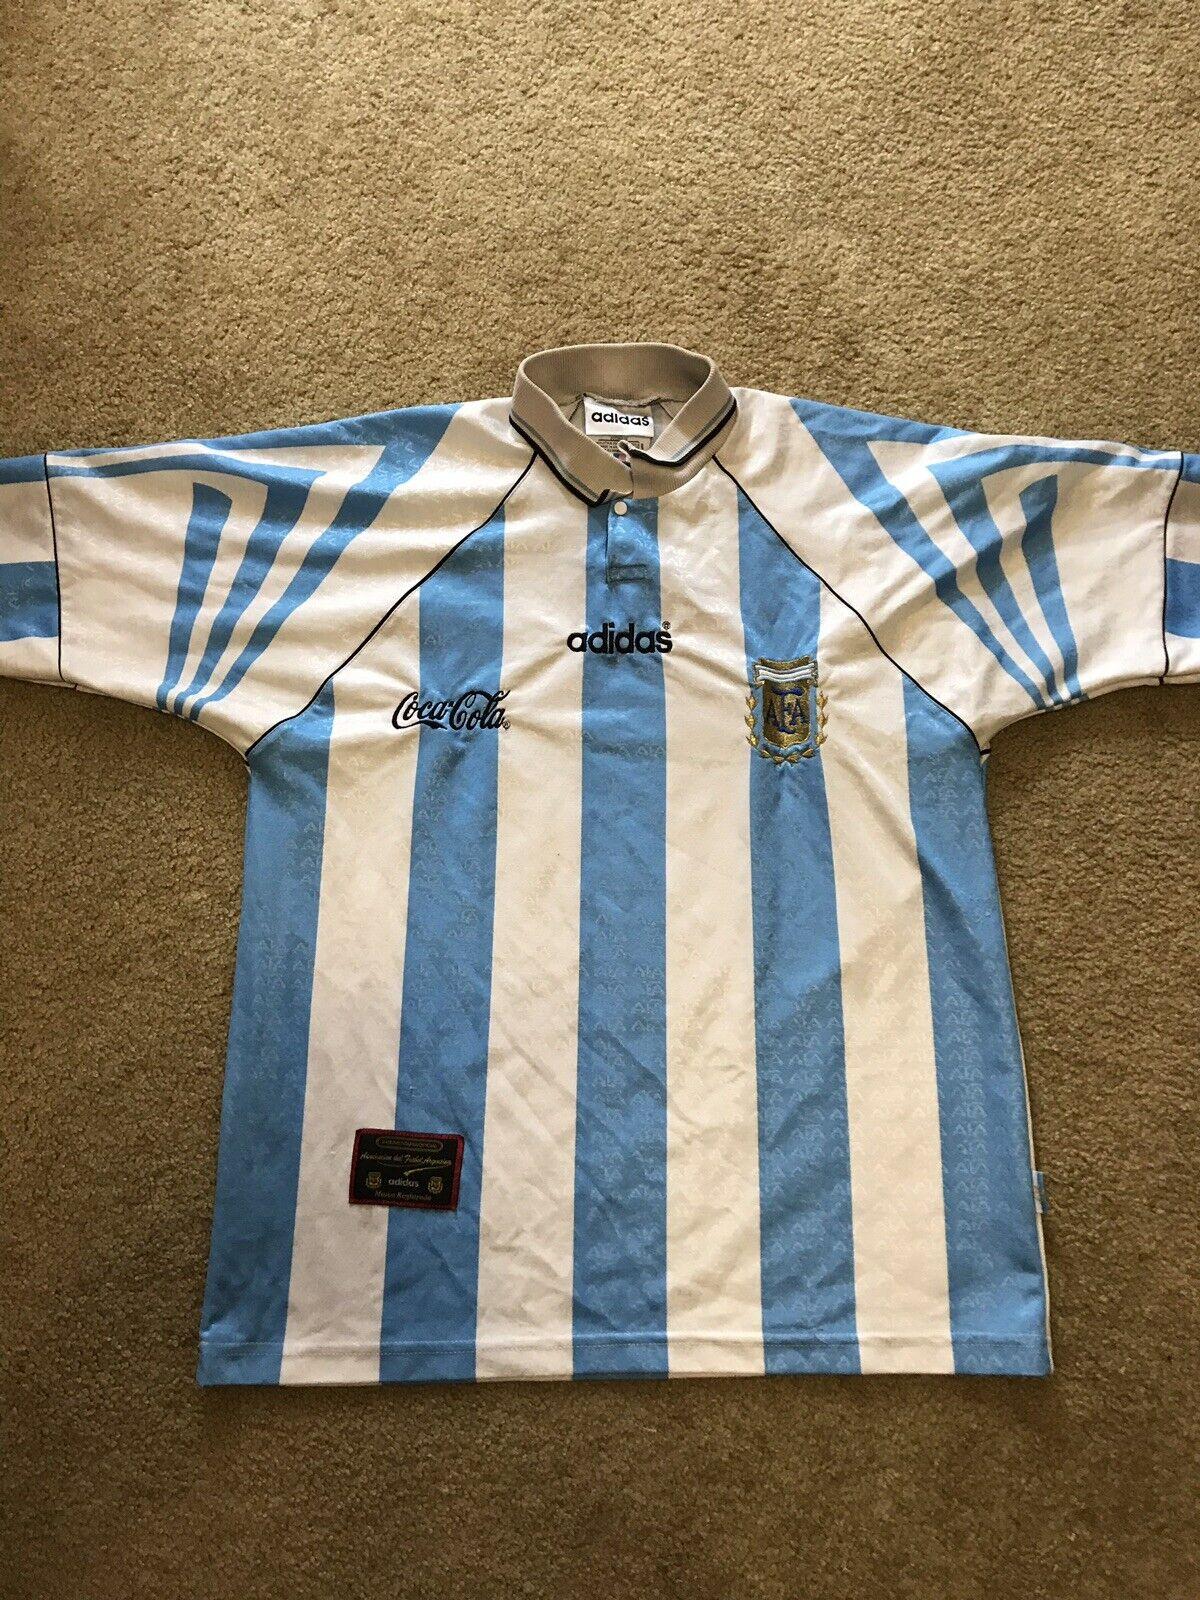 argentoINA 1996 NATIONAL squadra HOME SHIRT JERSEY Footbtutti Soccer ADIDAS Sz 3 M